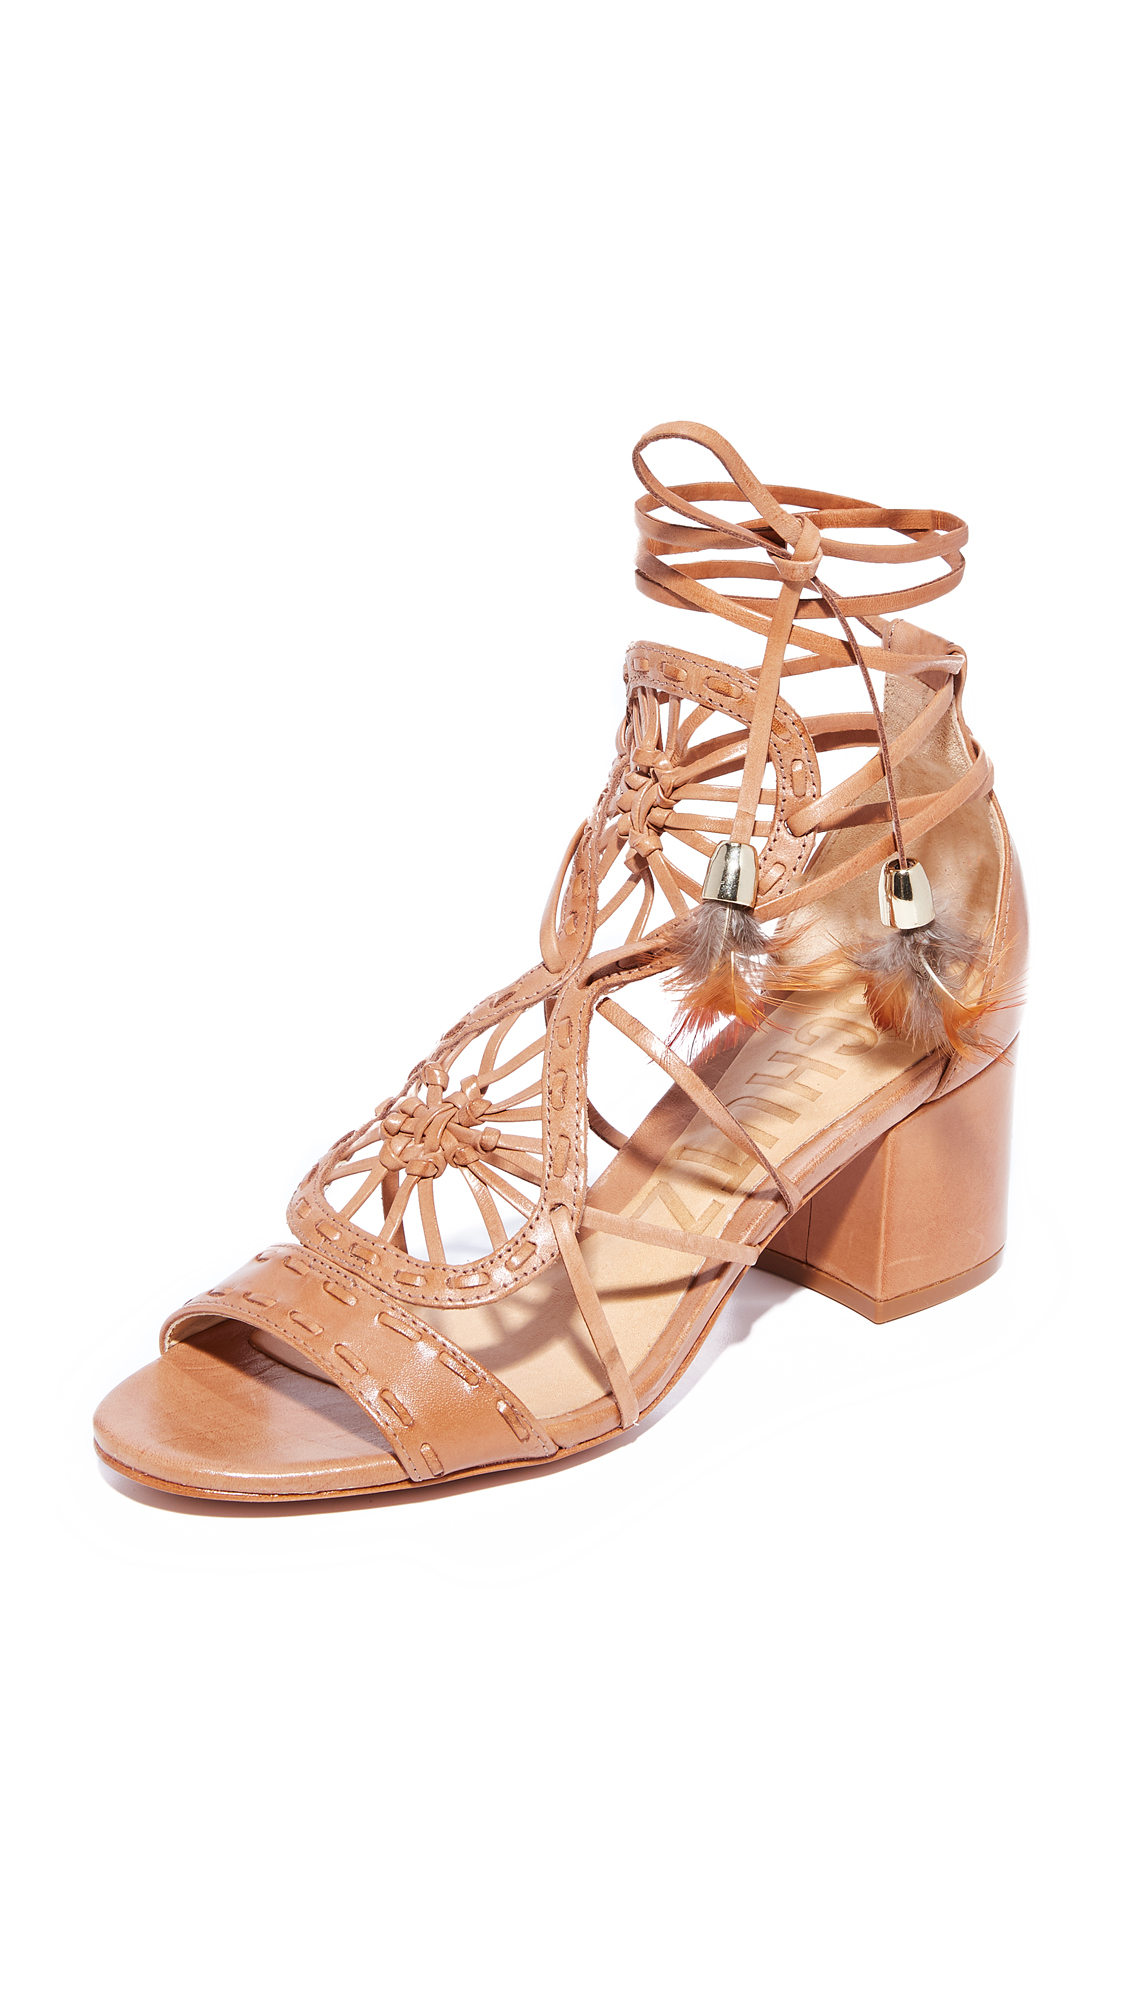 Schutz Alianna City Sandals - Desert